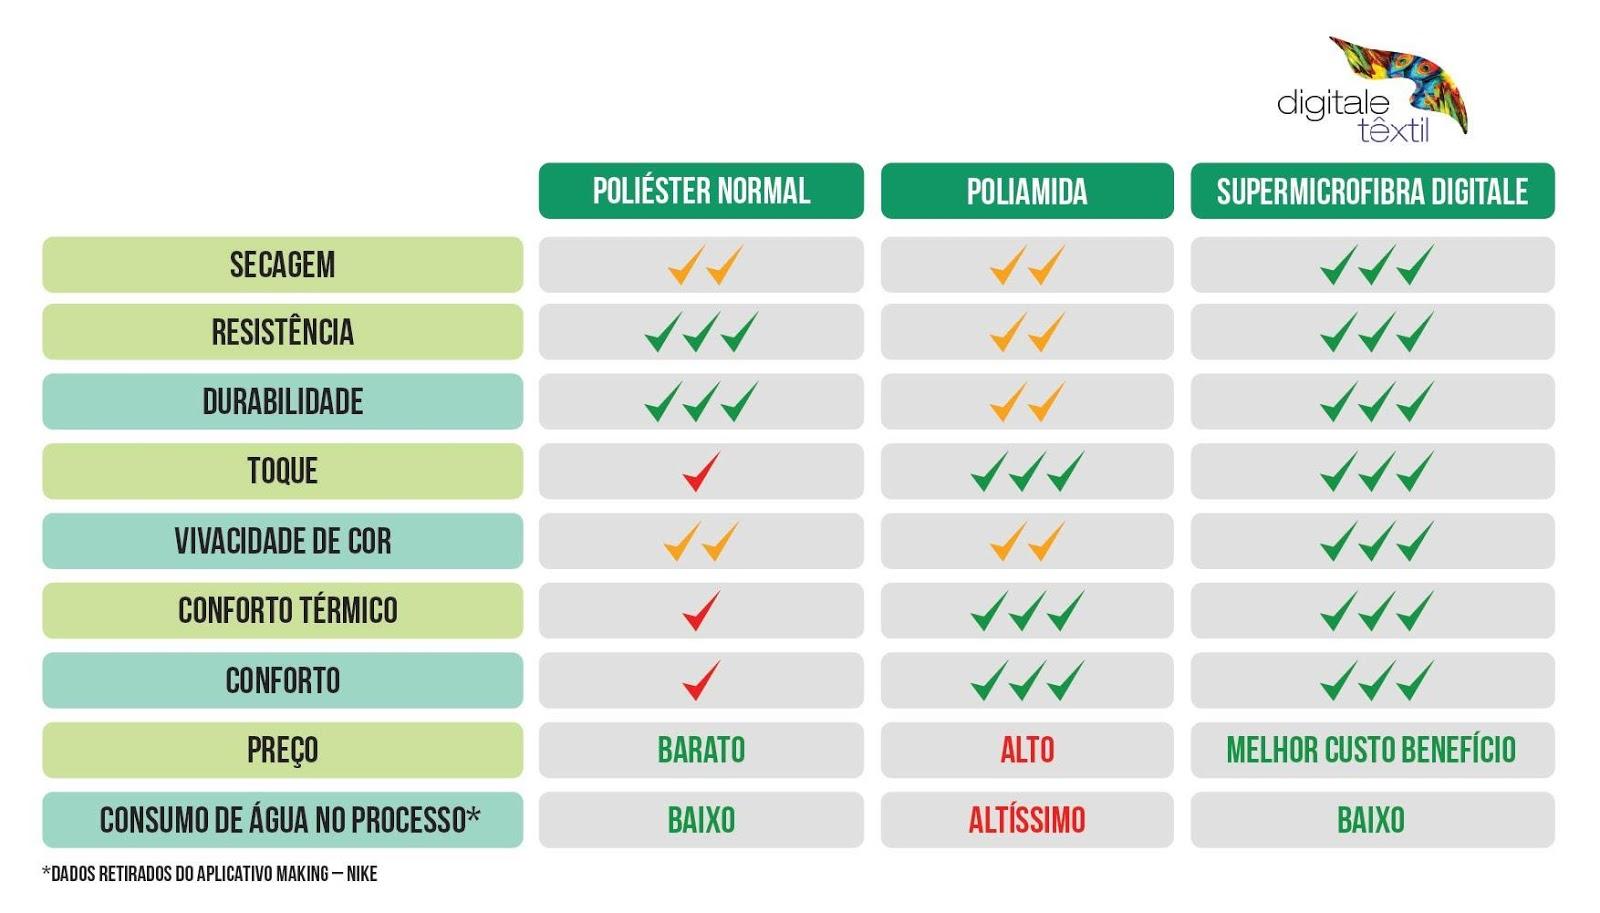 Tabela comparativa entre poliéster normal, poliamida e supermicrofibra